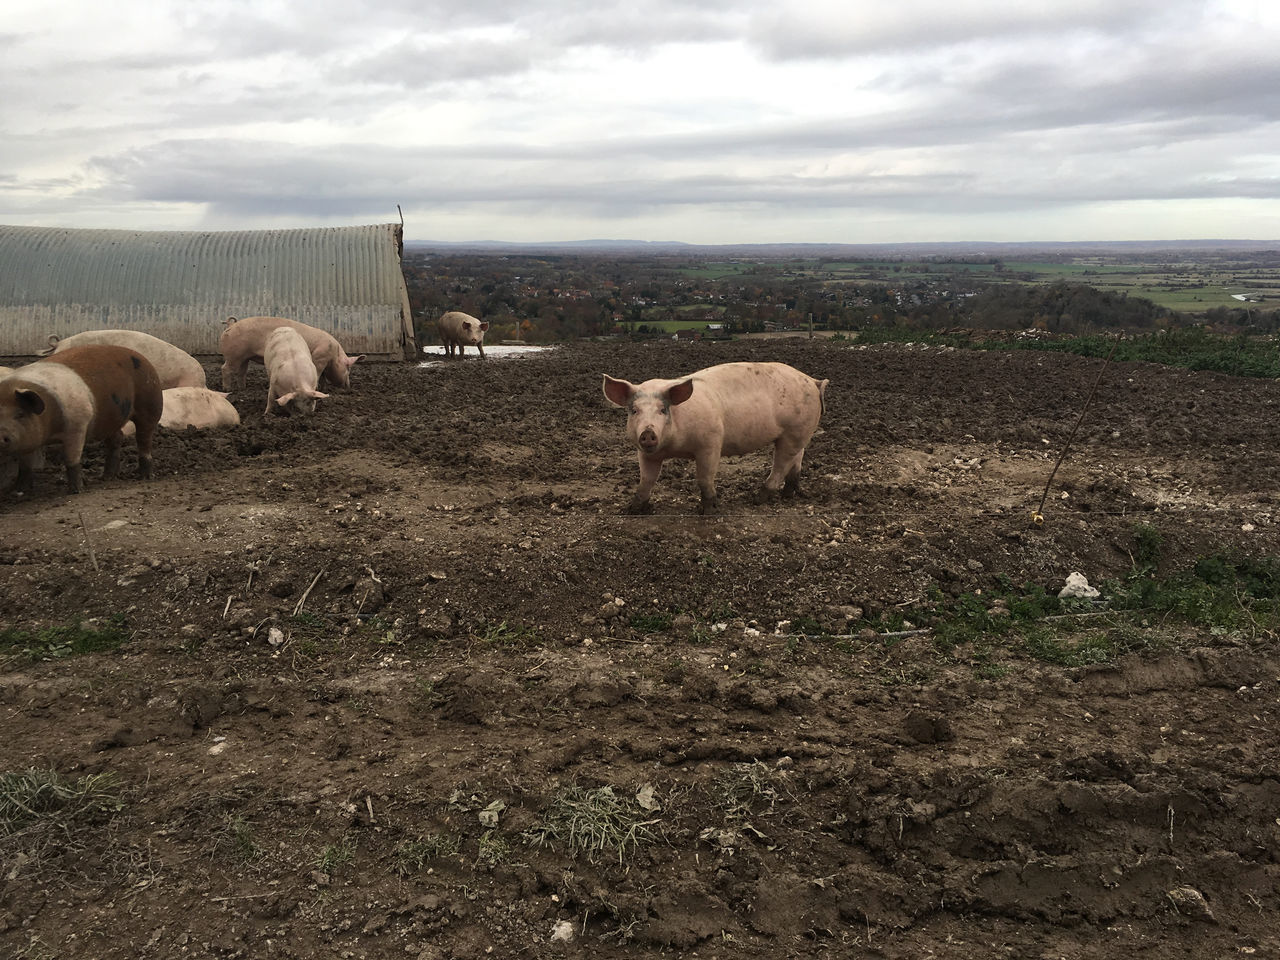 OK? Animal Themes Farm Livestock Mammal Mud Muddy No People Pig Pigs